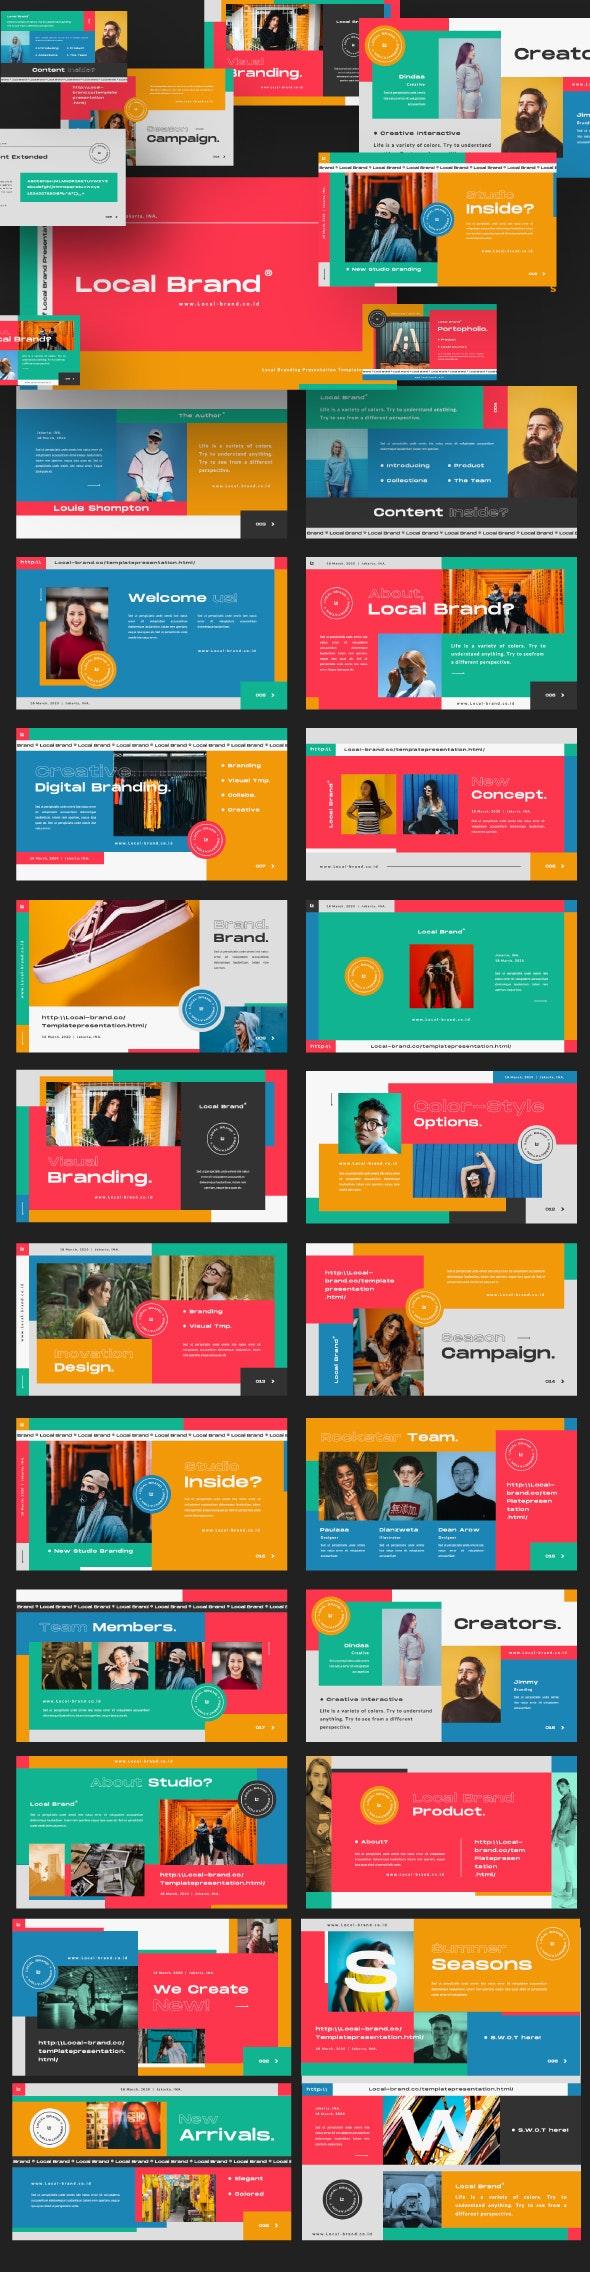 Local Brand Creative Google Slide - Google Slides Presentation Templates